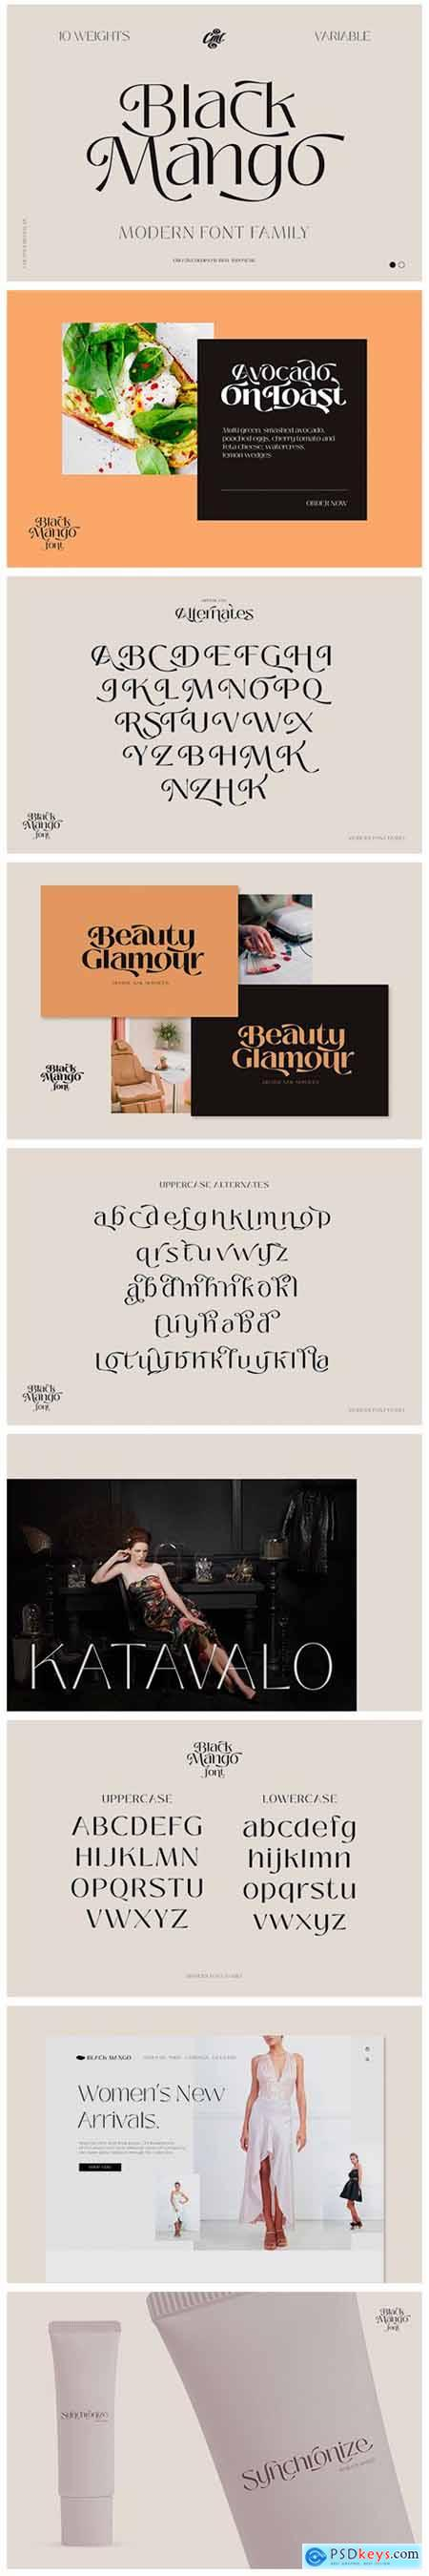 Black Mango - Modern Beauty Font 5484322